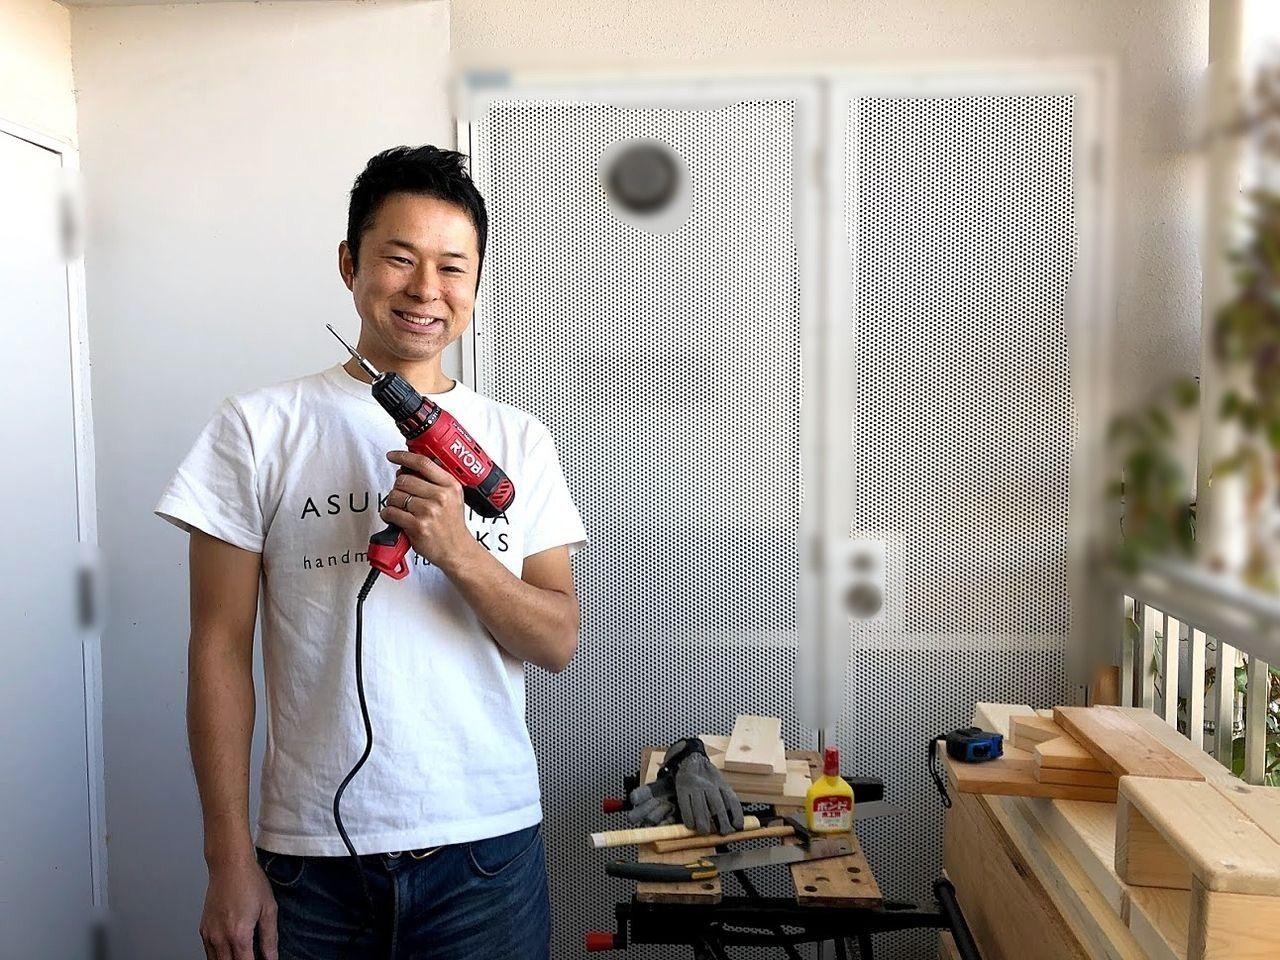 Asukayama Works(アスカヤマワークス)の齊藤 琢磨さん